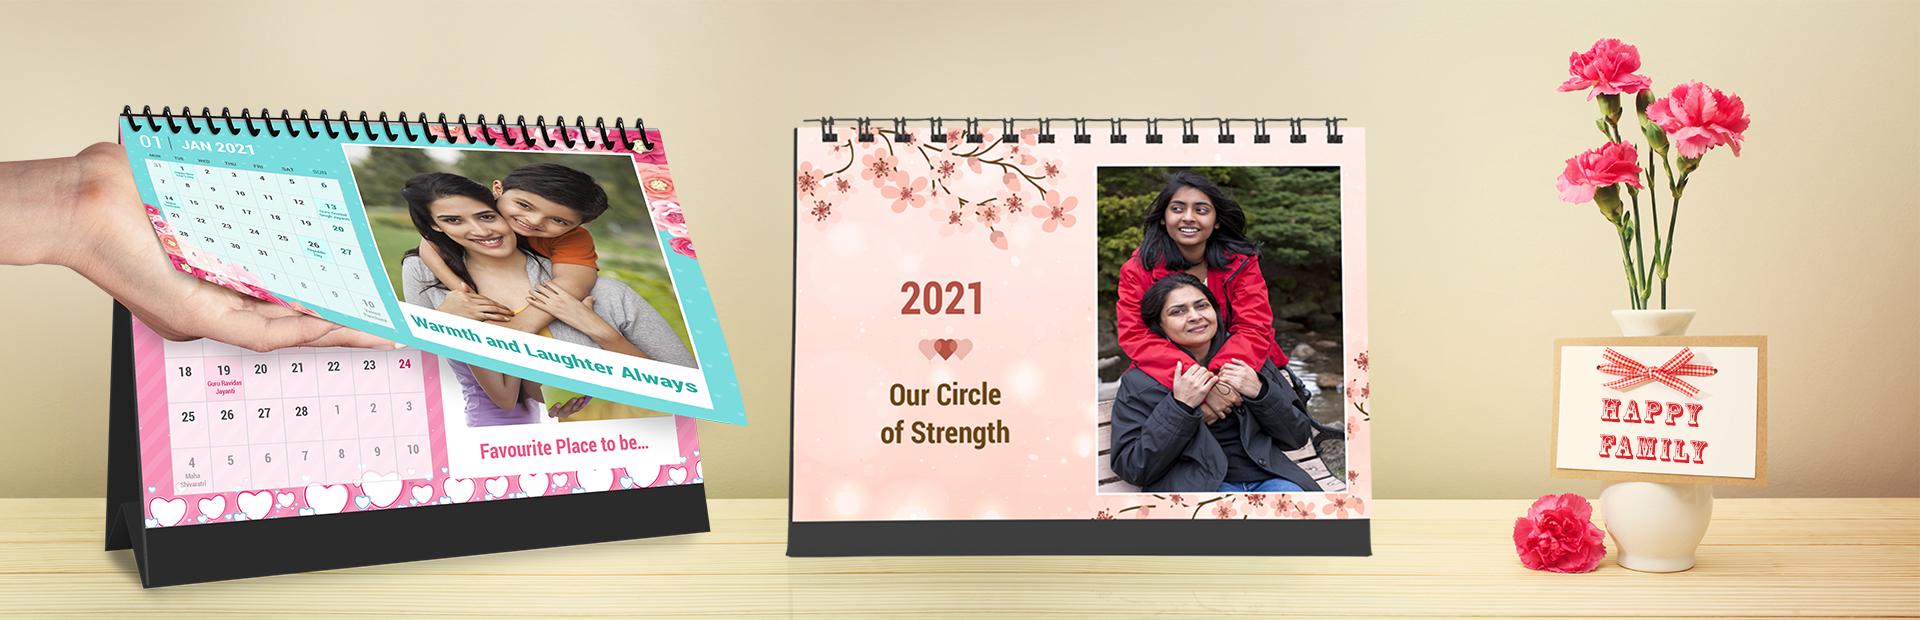 Family Joy Photo Calendars Online